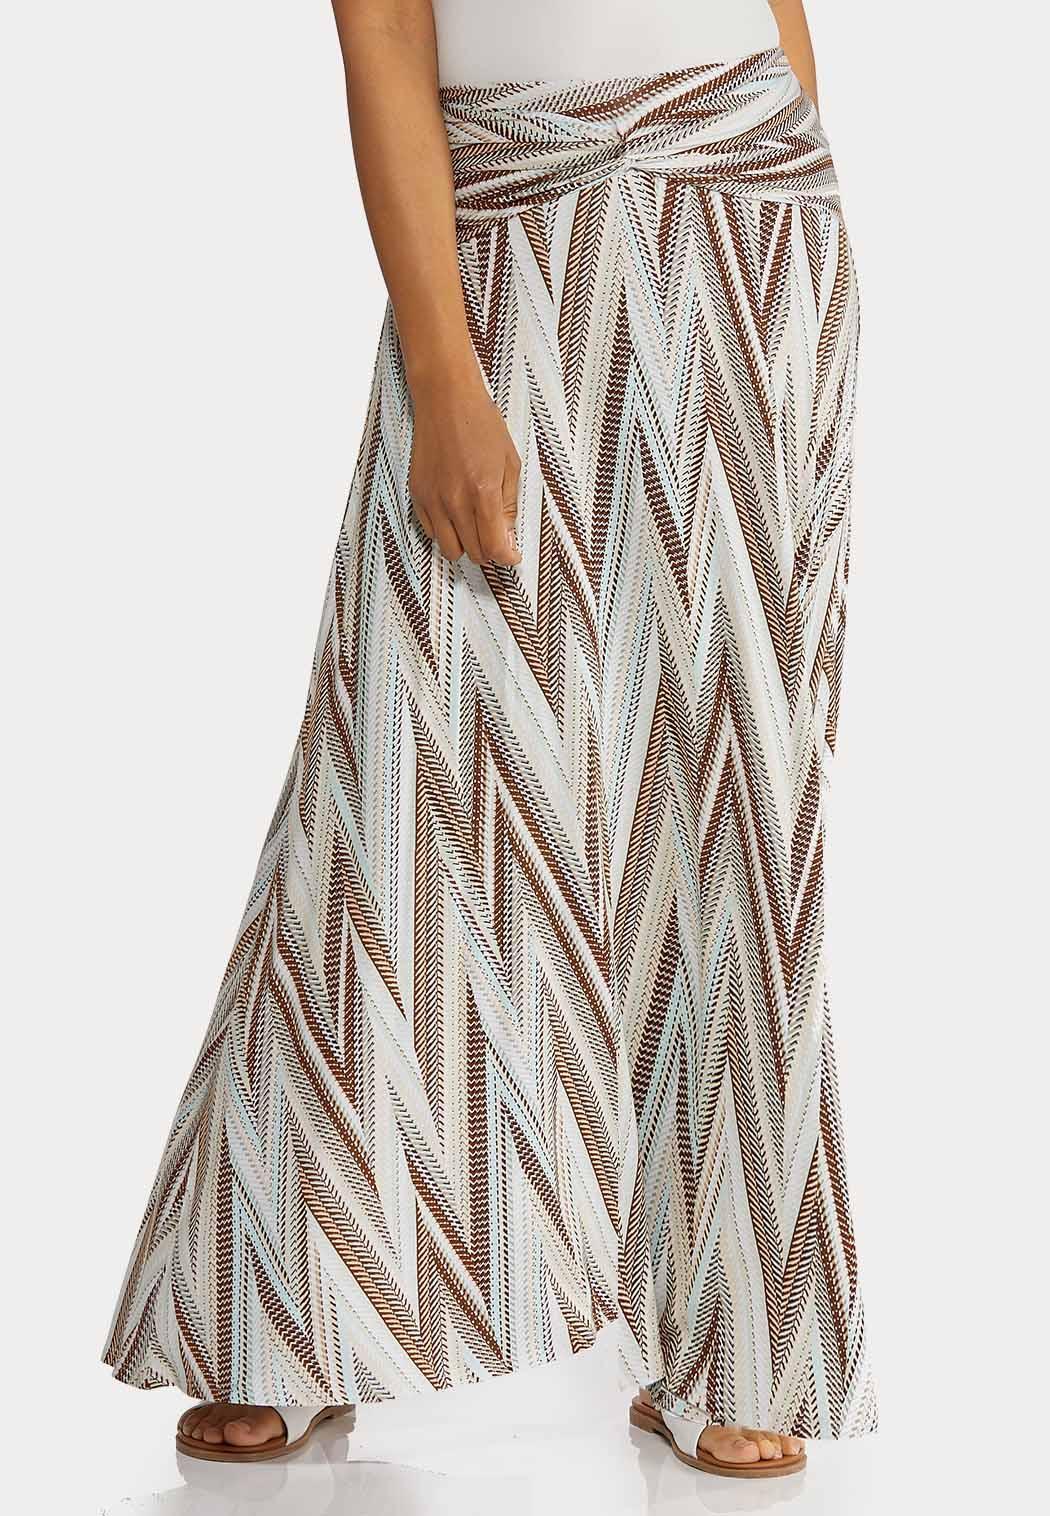 Petite Chevron Maxi Skirt